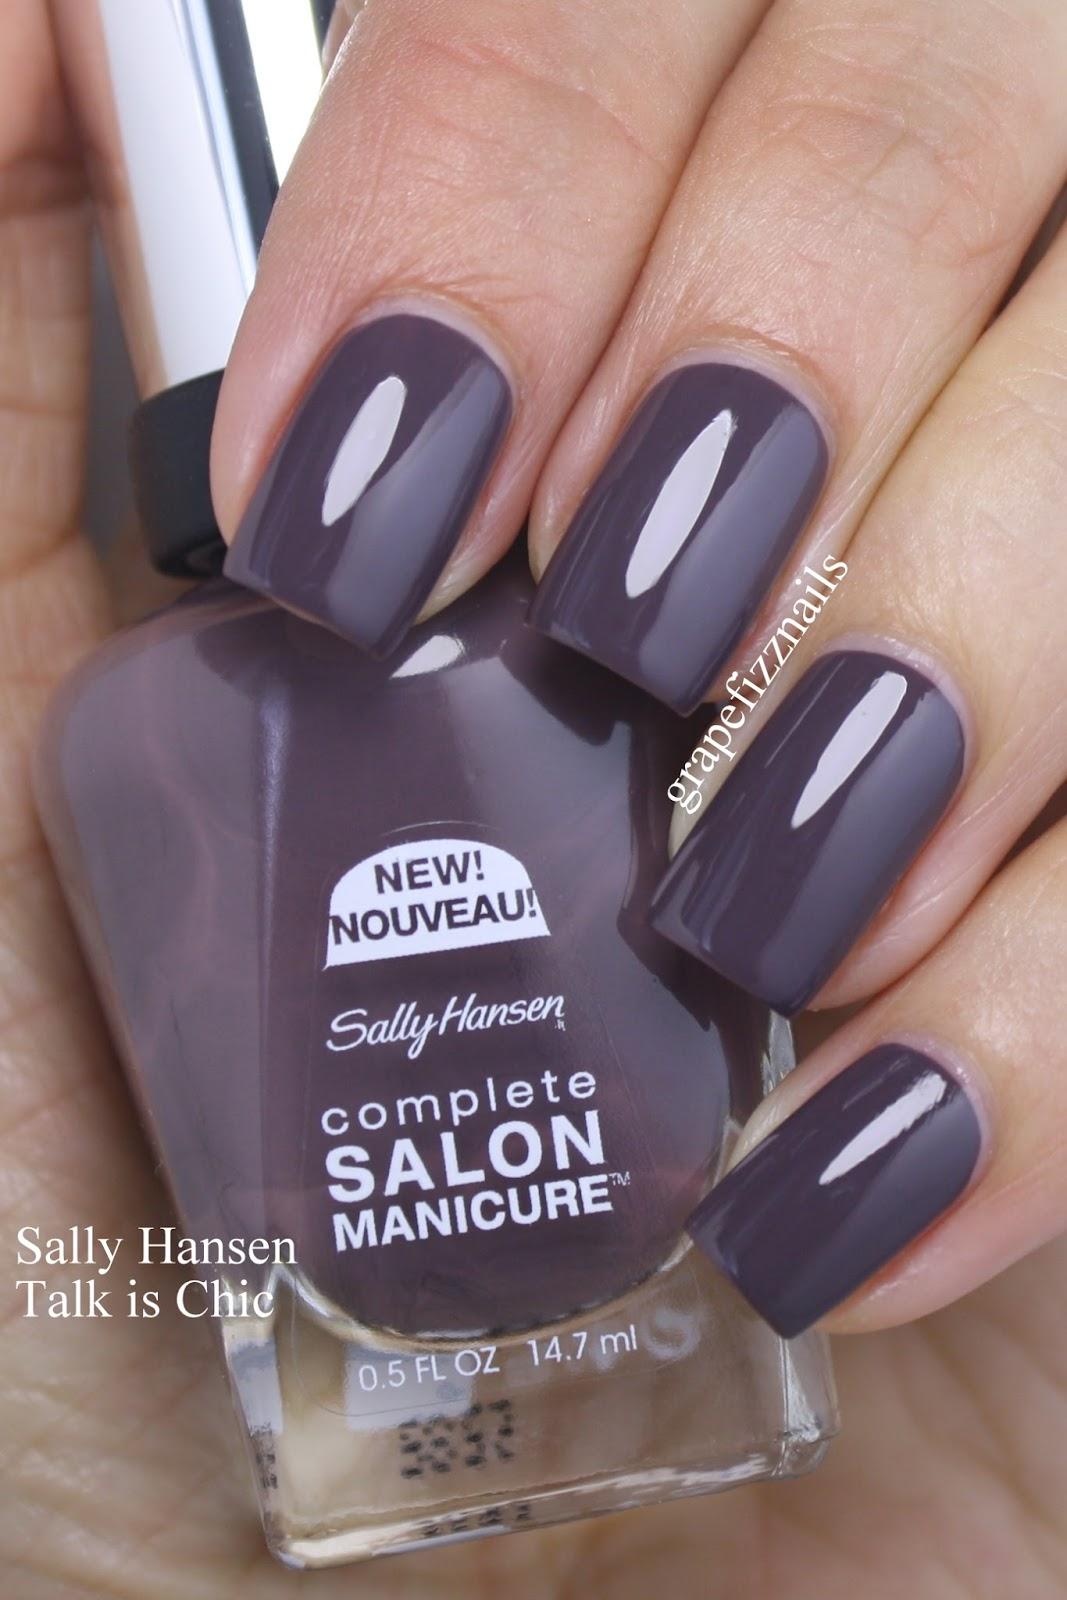 Grape Fizz Nails Sally Hansen Fall Collection 2016 Complete Salon Manicure